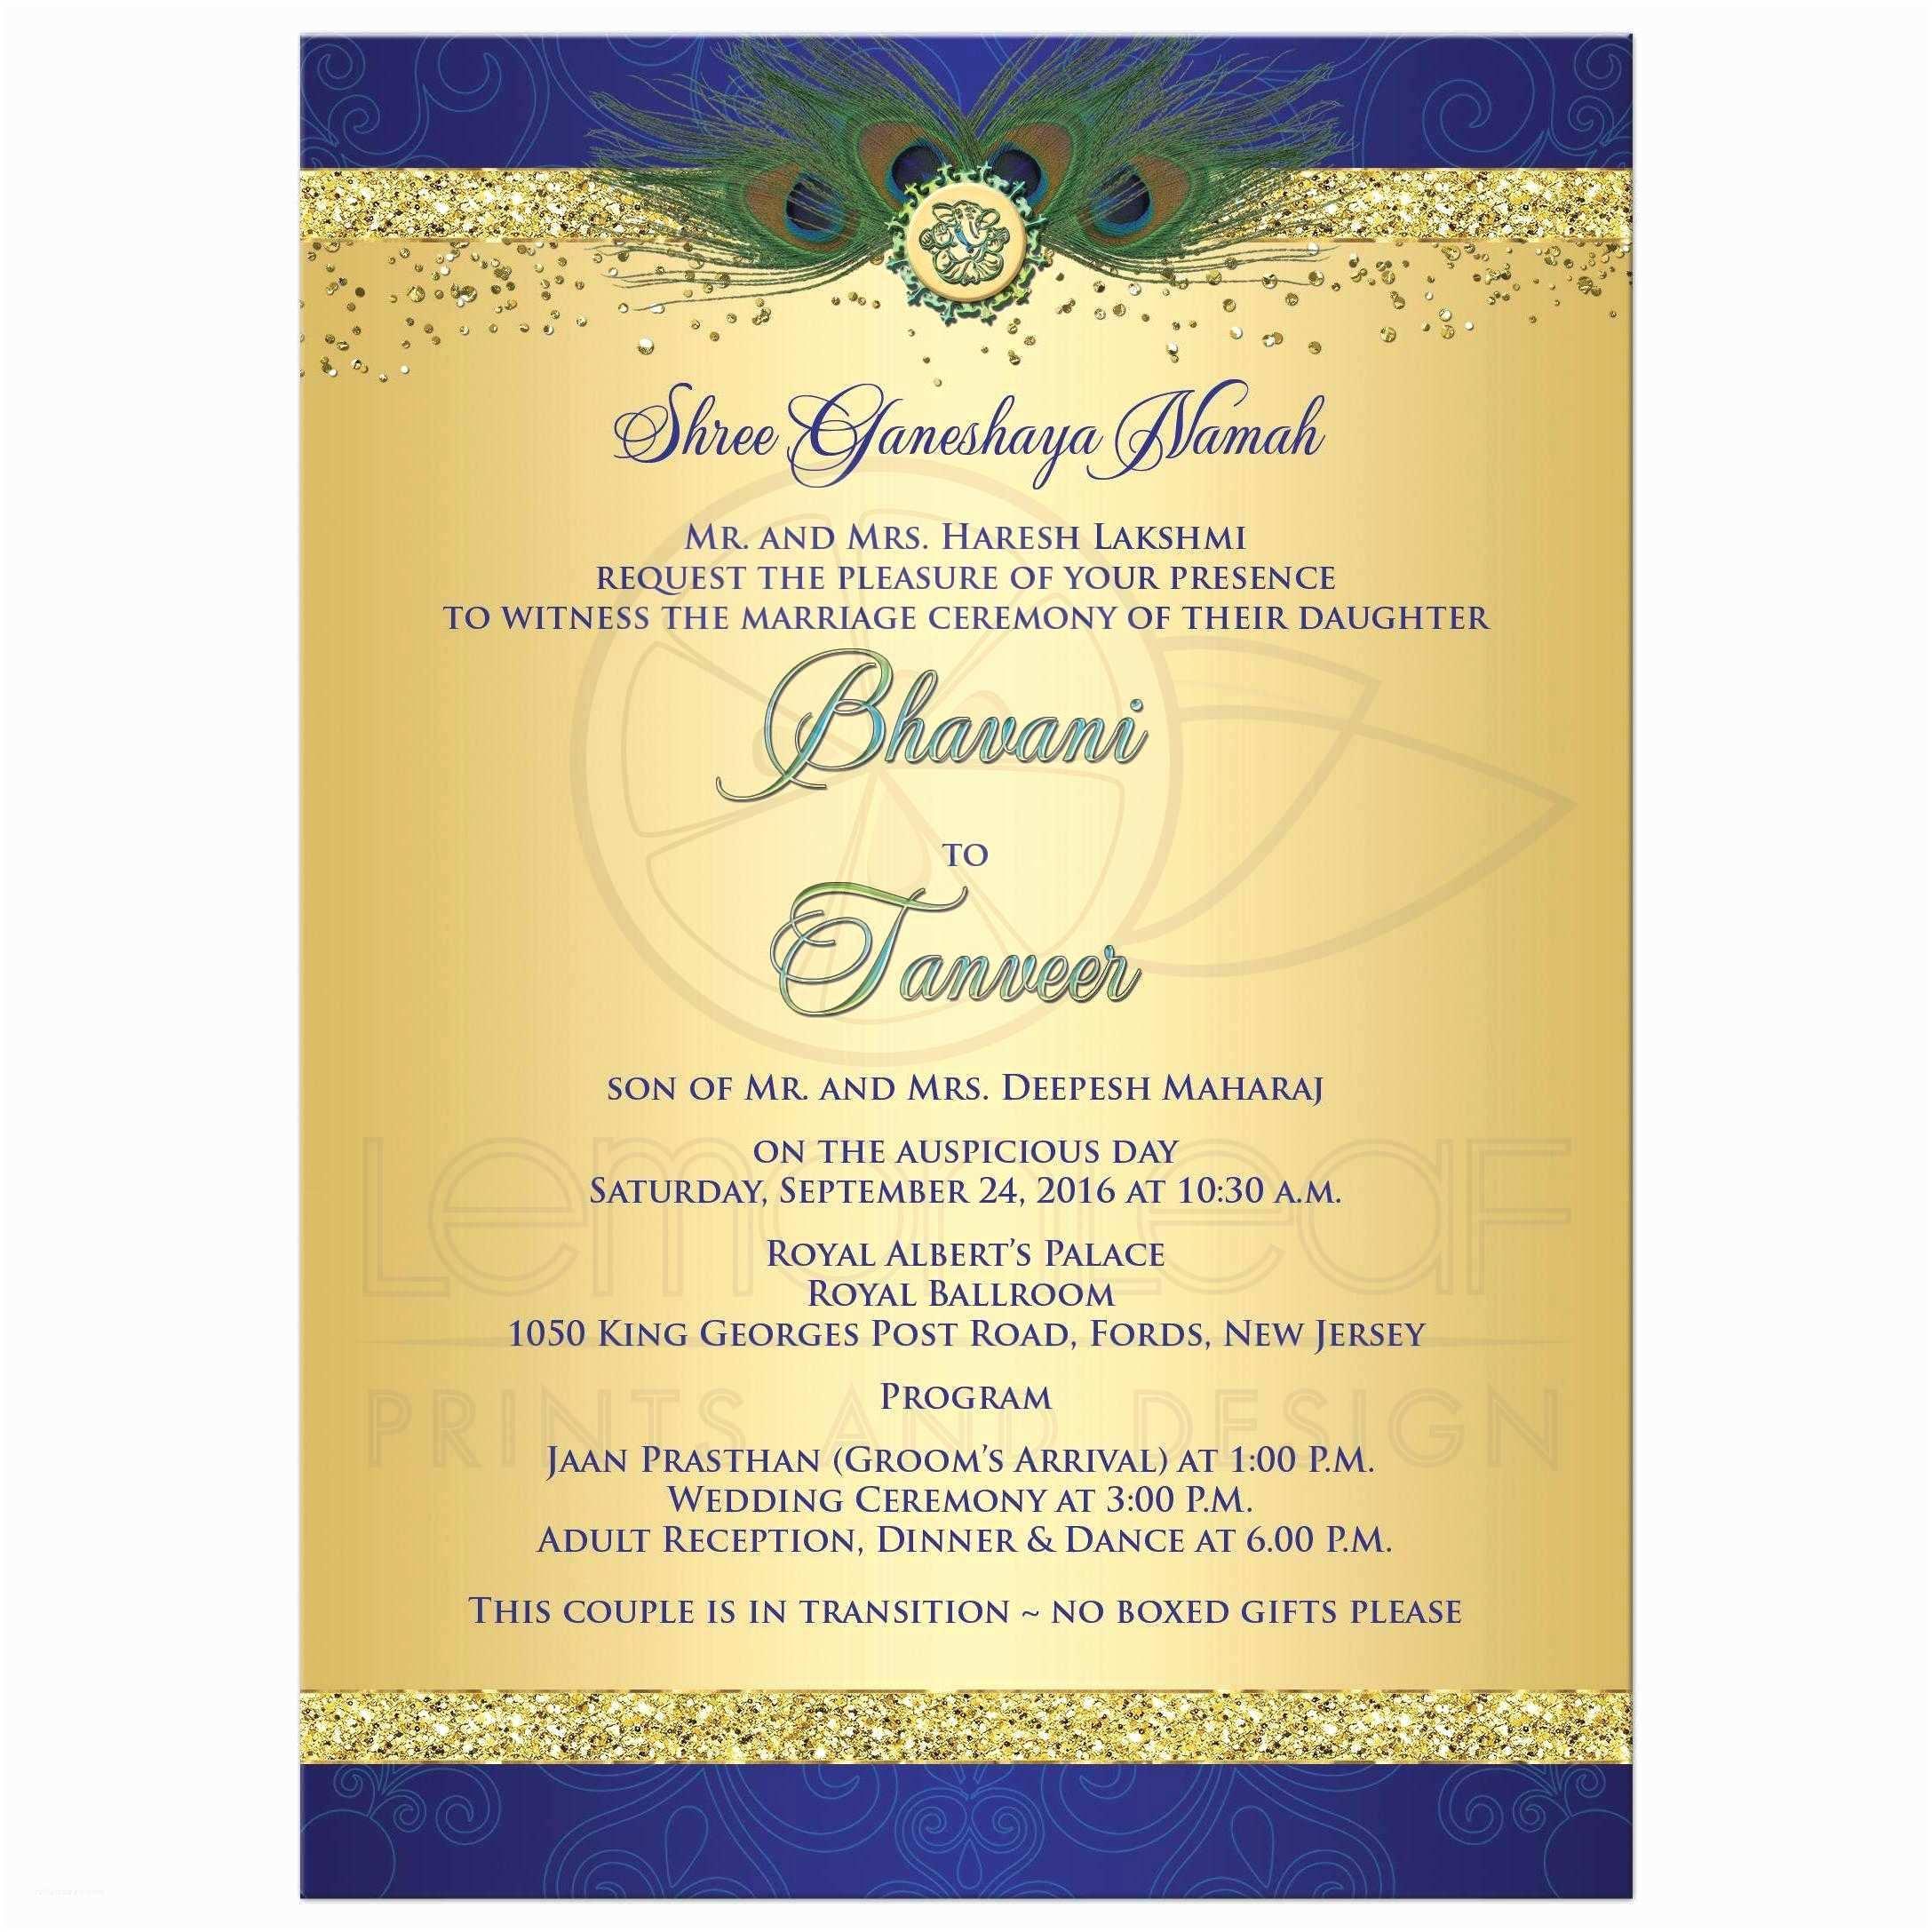 Indian Wedding Invitation Wording Indian Wedding Invitation Cards Indian Wedding